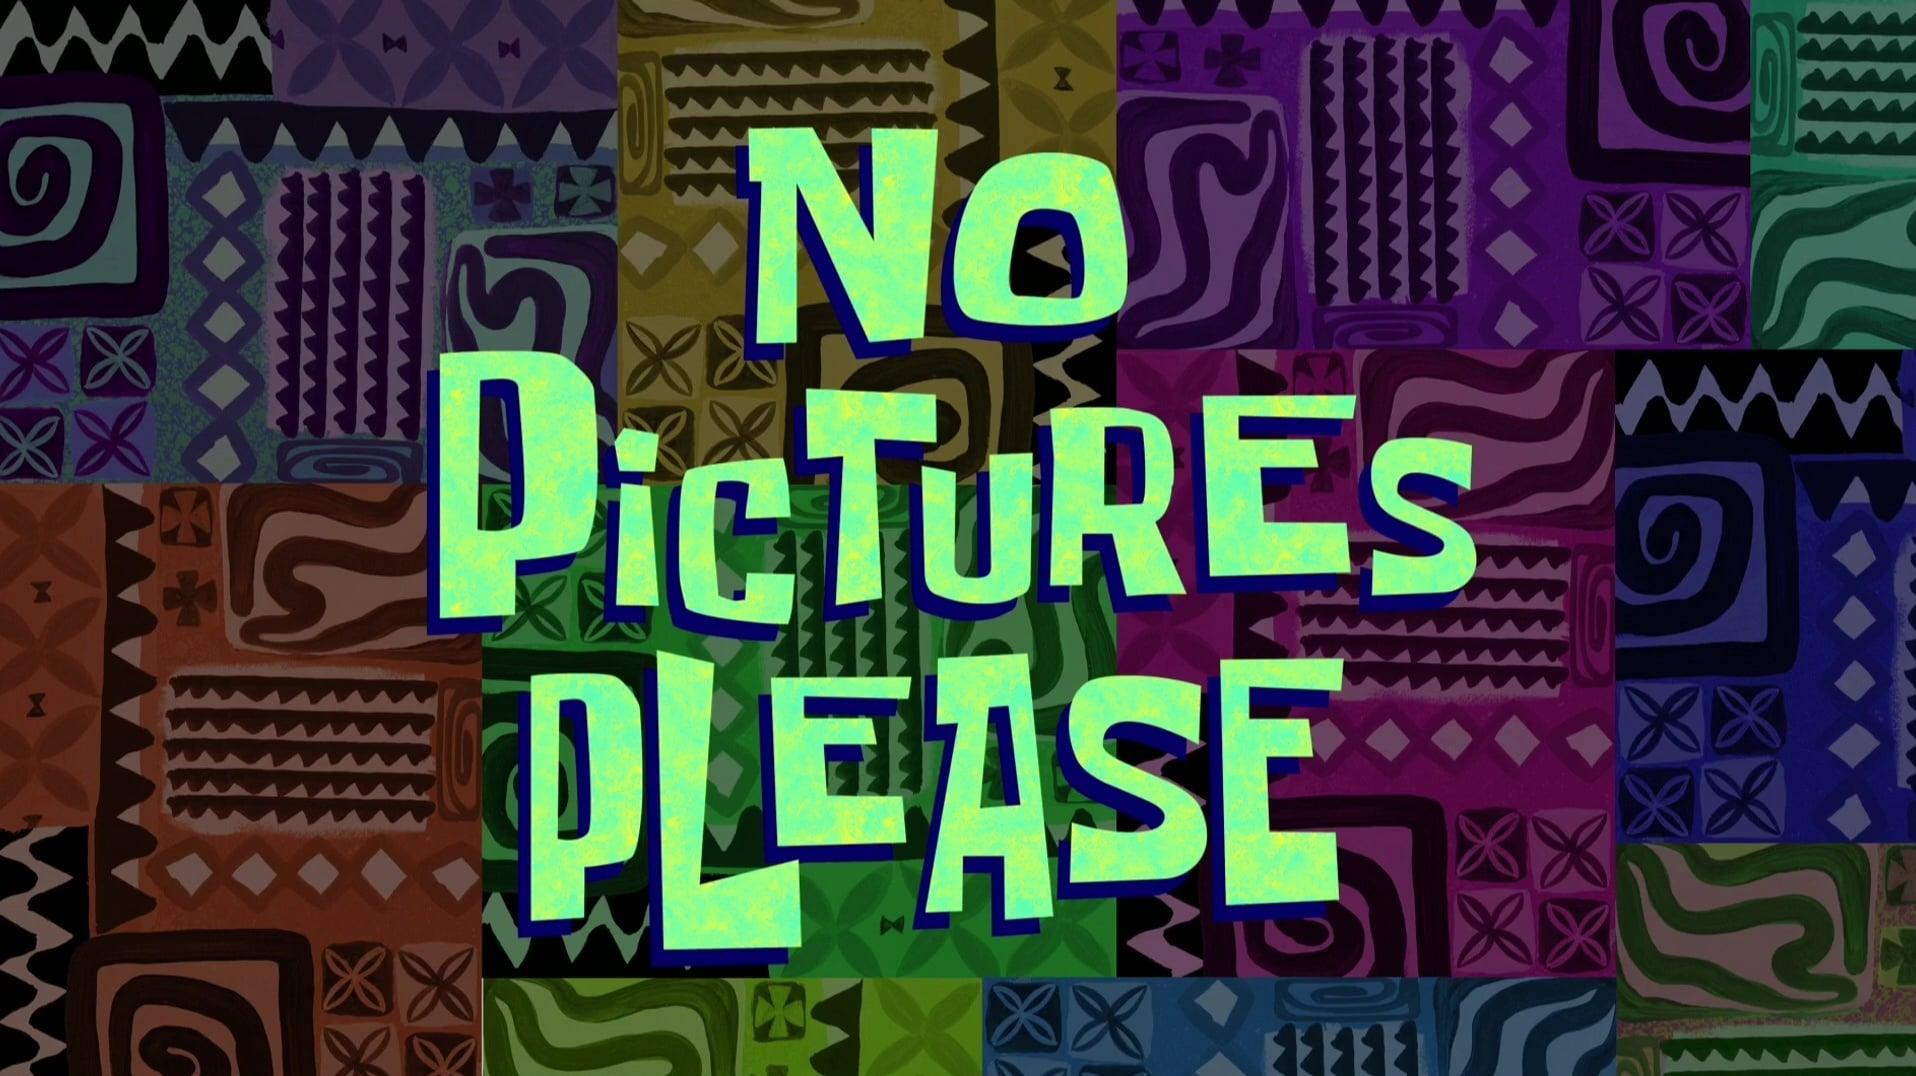 SpongeBob SquarePants - Season 11 Episode 10 : No Pictures, Please